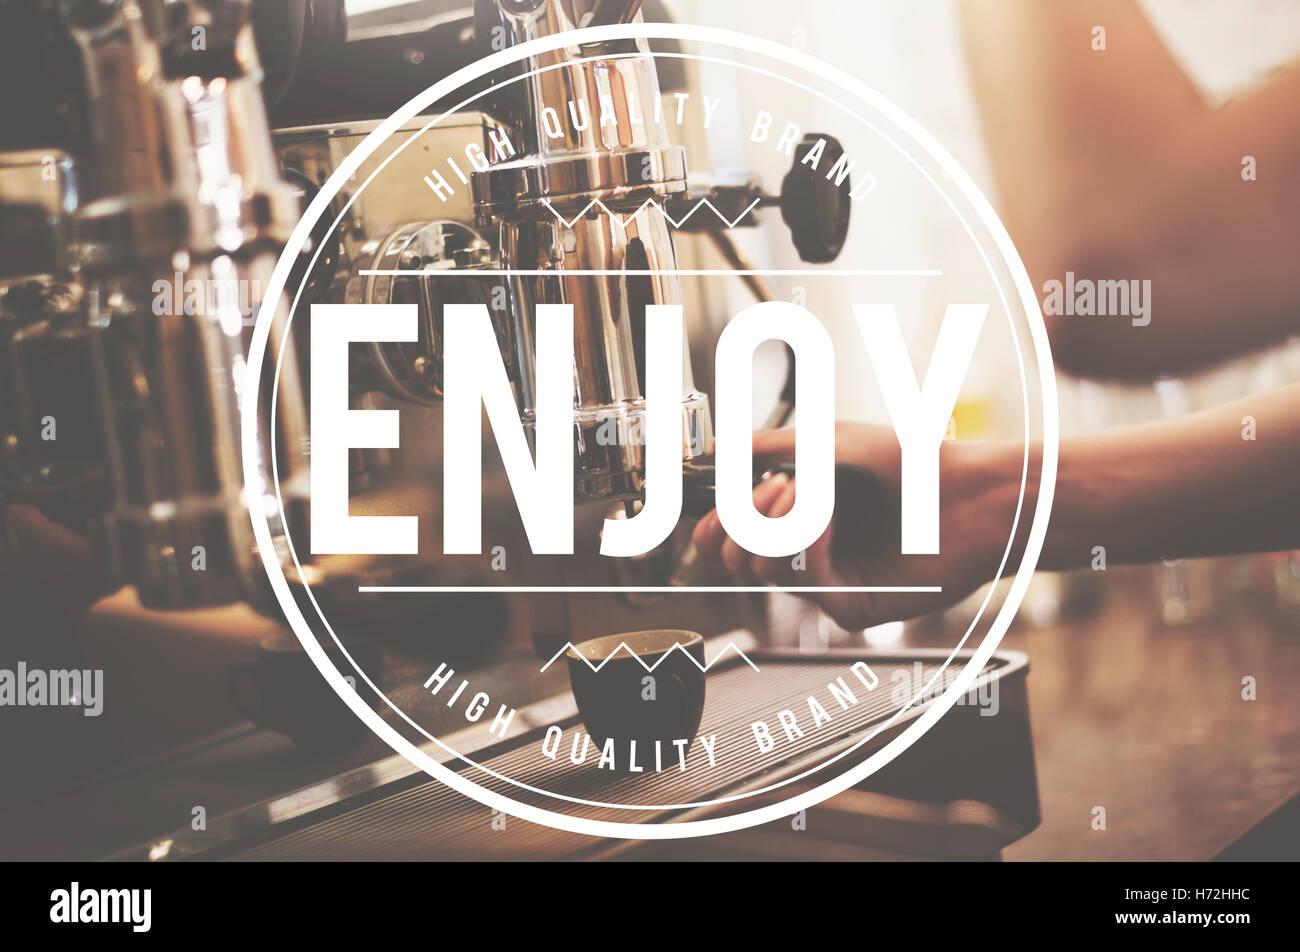 Enjoy Happiness Satisfaction Pleasurable Concept - Stock Image